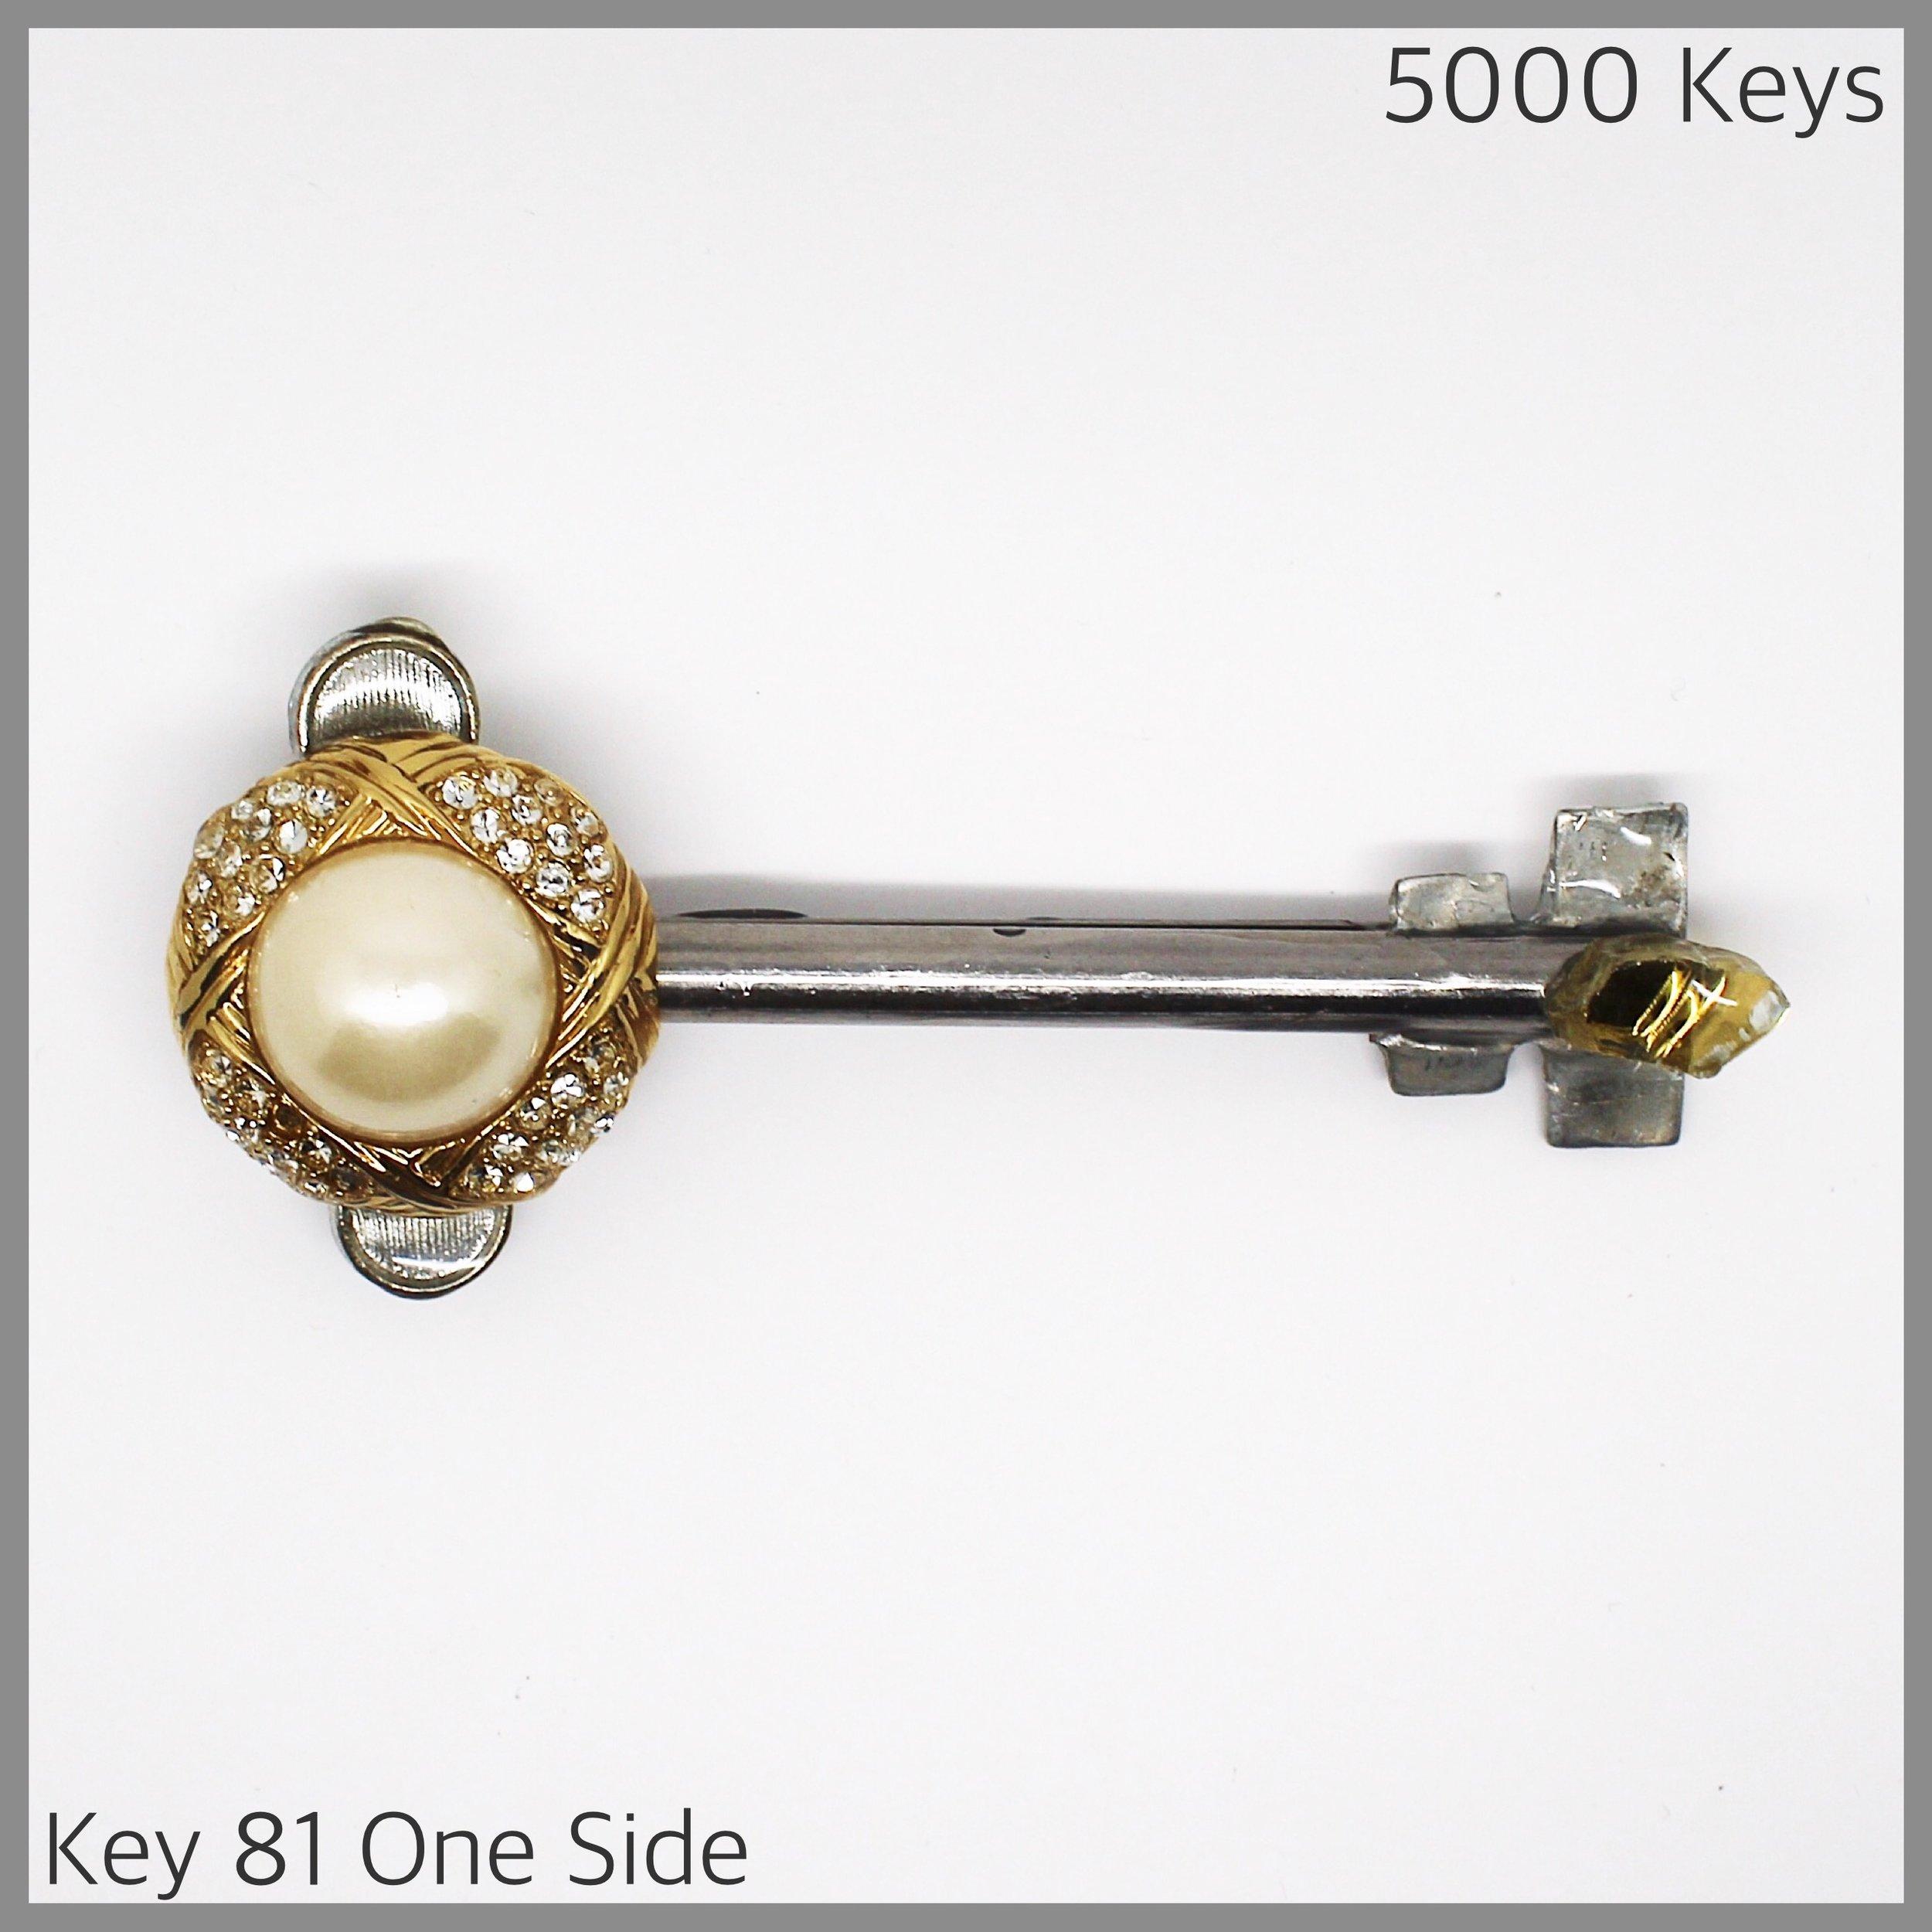 Key 81 one side - 1.JPG